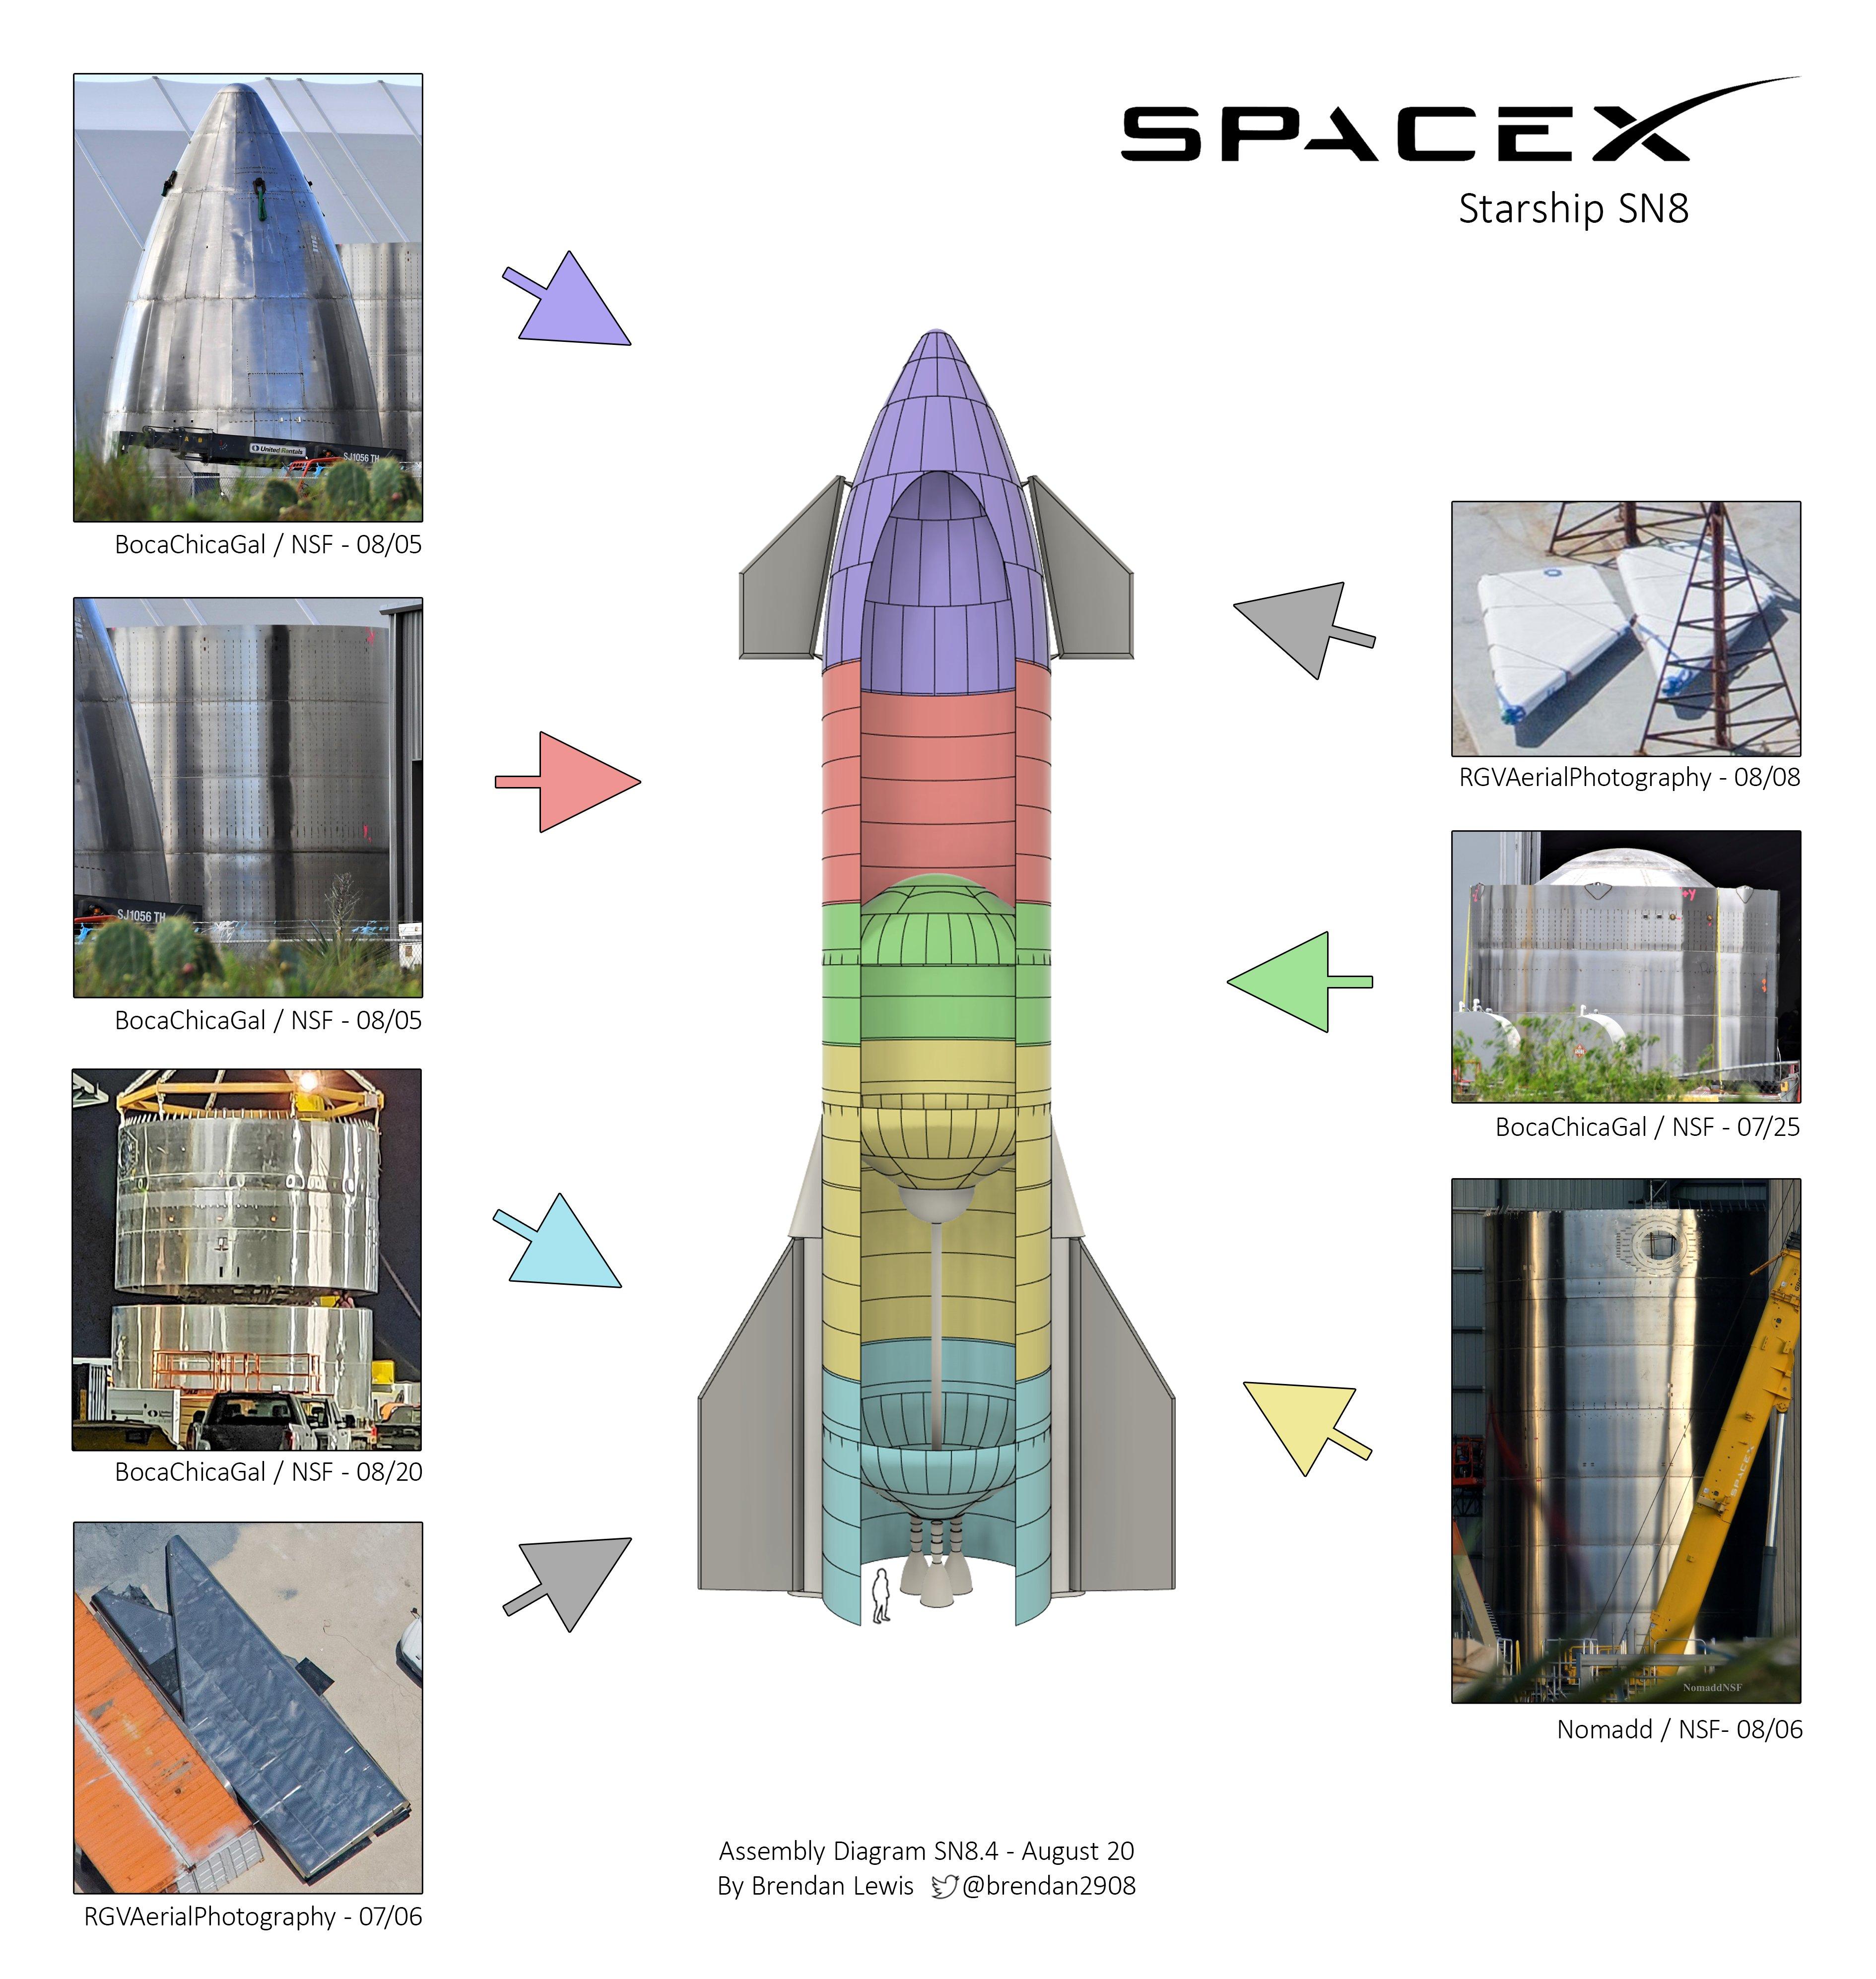 Starship SN8 (Boca Chica) (1/2) Ef1eHIfUYAA8PBa?format=jpg&name=4096x4096